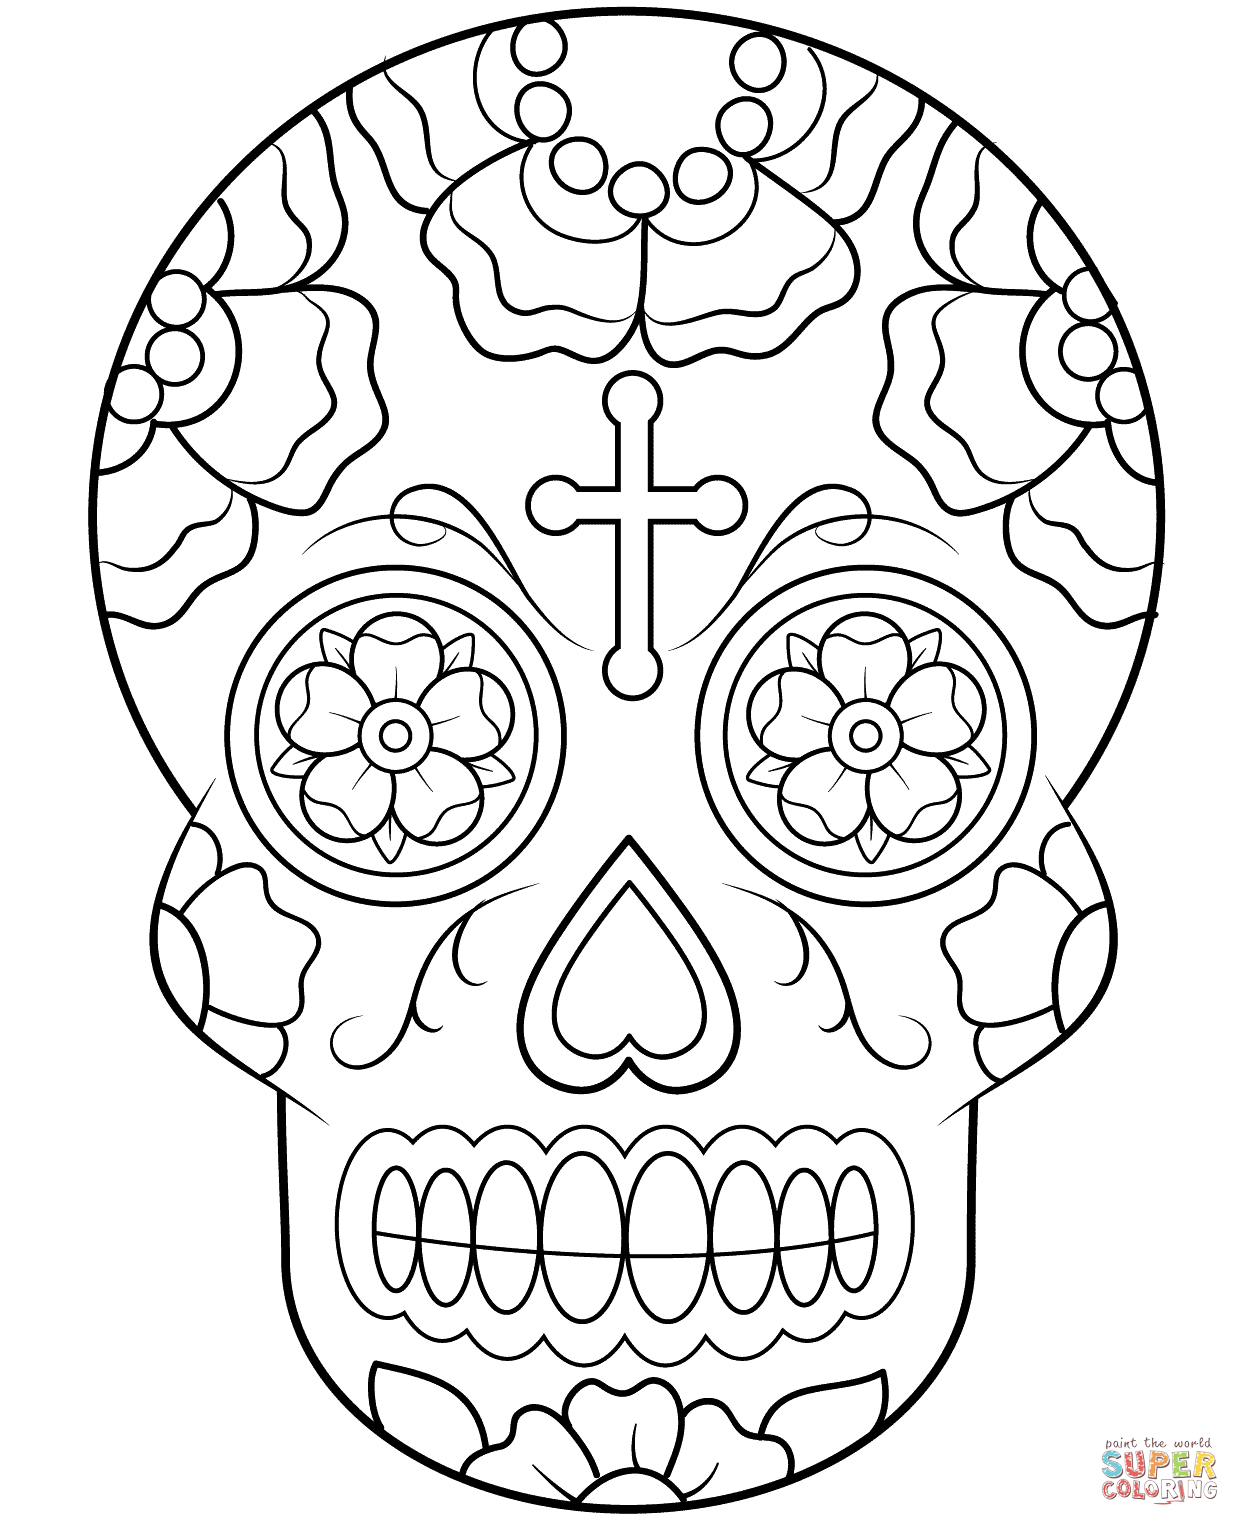 1240x1526 Calavera (Sugar Skull) Coloring Page Free Printable Coloring Pages